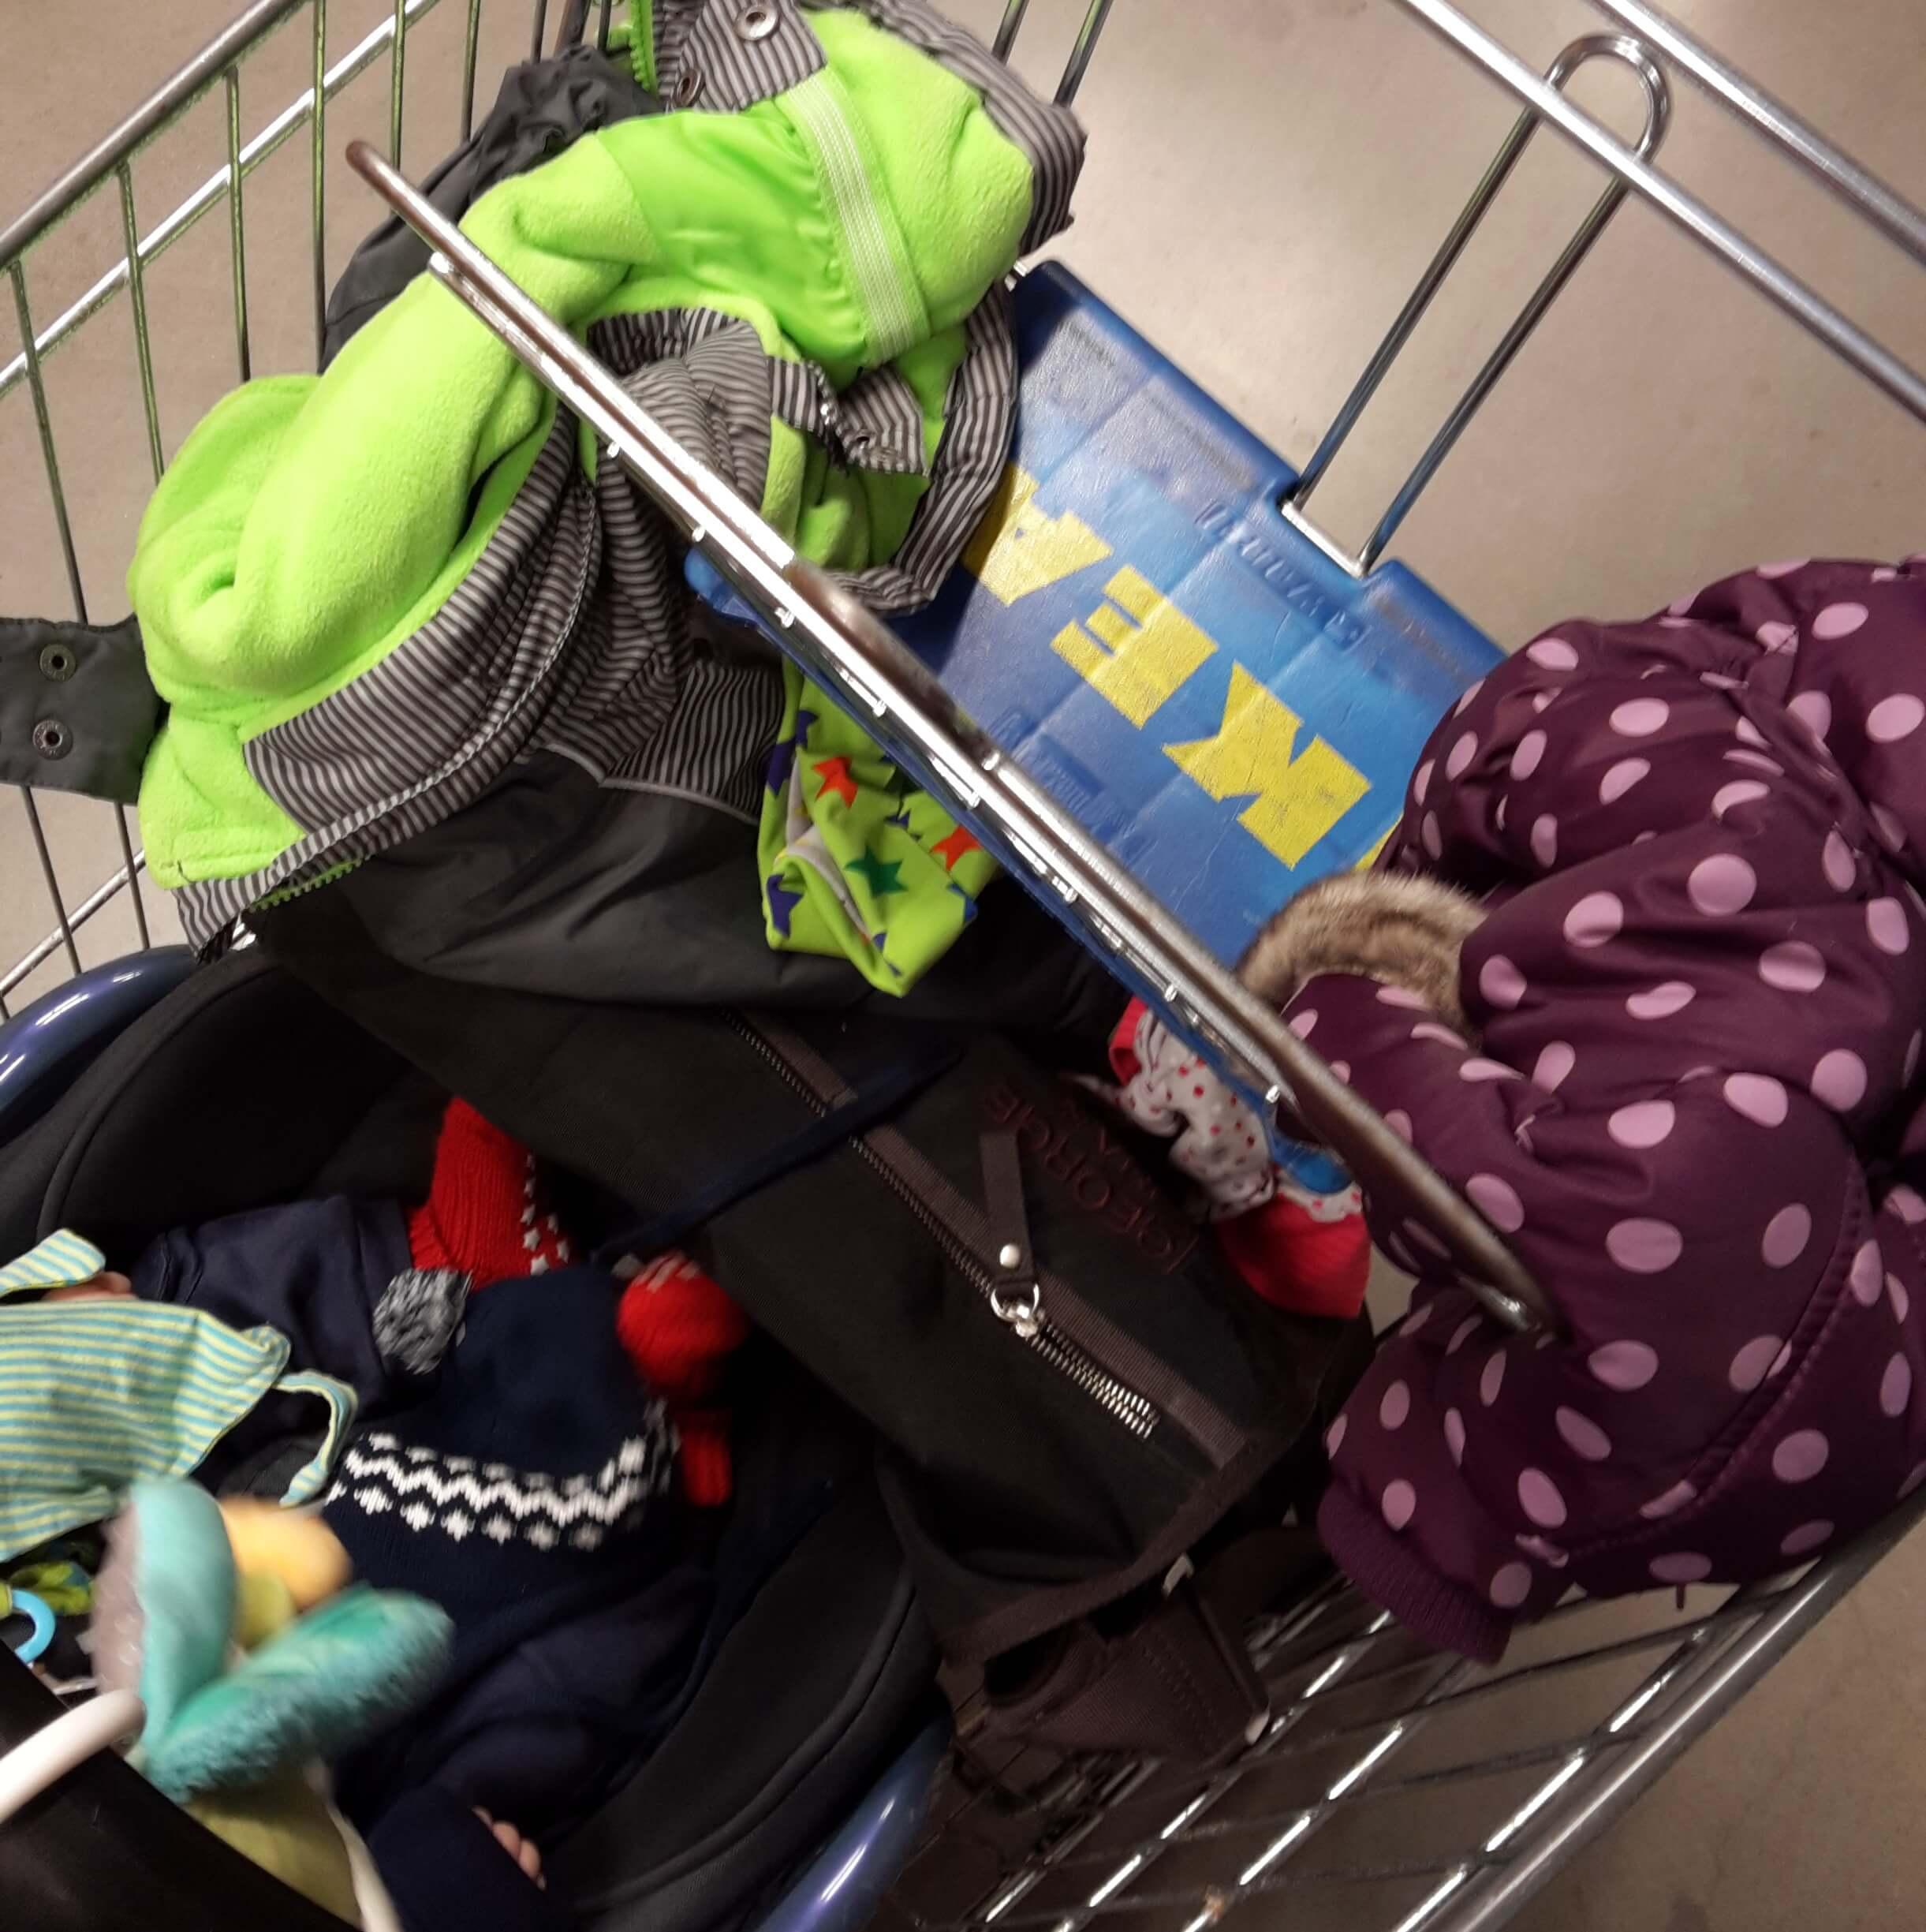 Kinder-Chaos bei IKEA